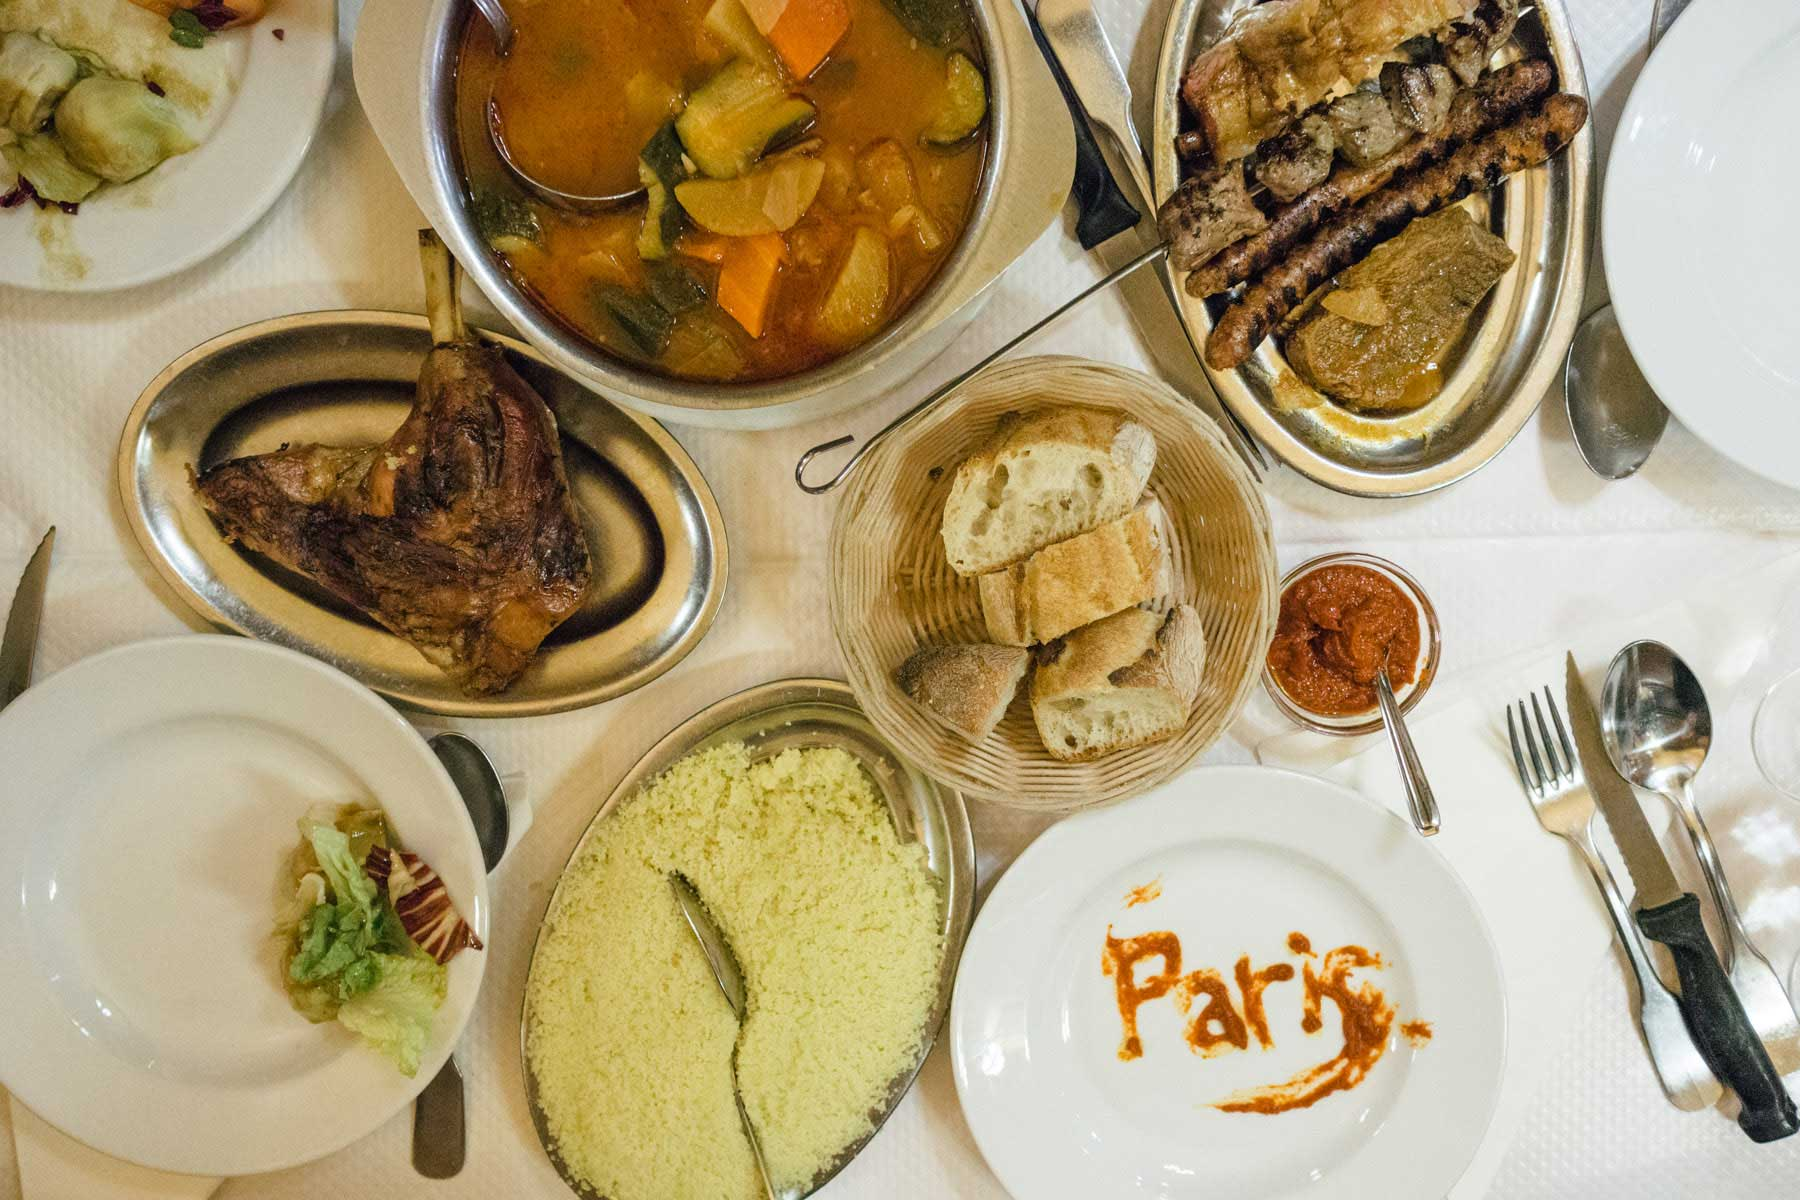 Crédito foto: http://www.thatfoodcray.com/paris-cray-moroccan-food-at-chez-omar/